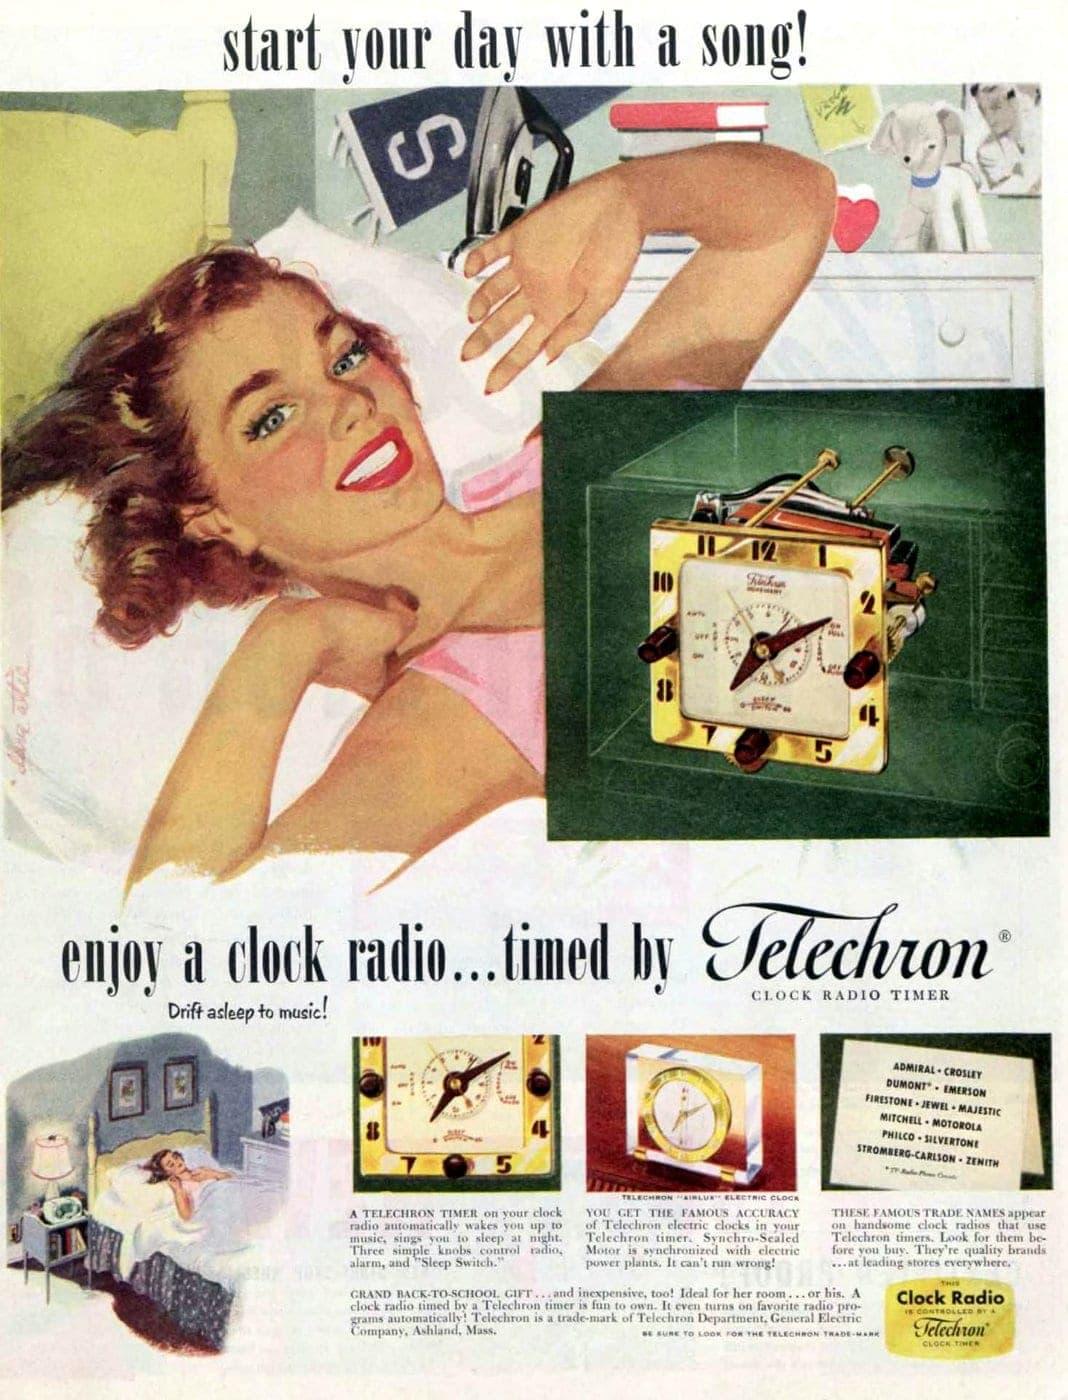 Vintage Telechron clock radio from 1951